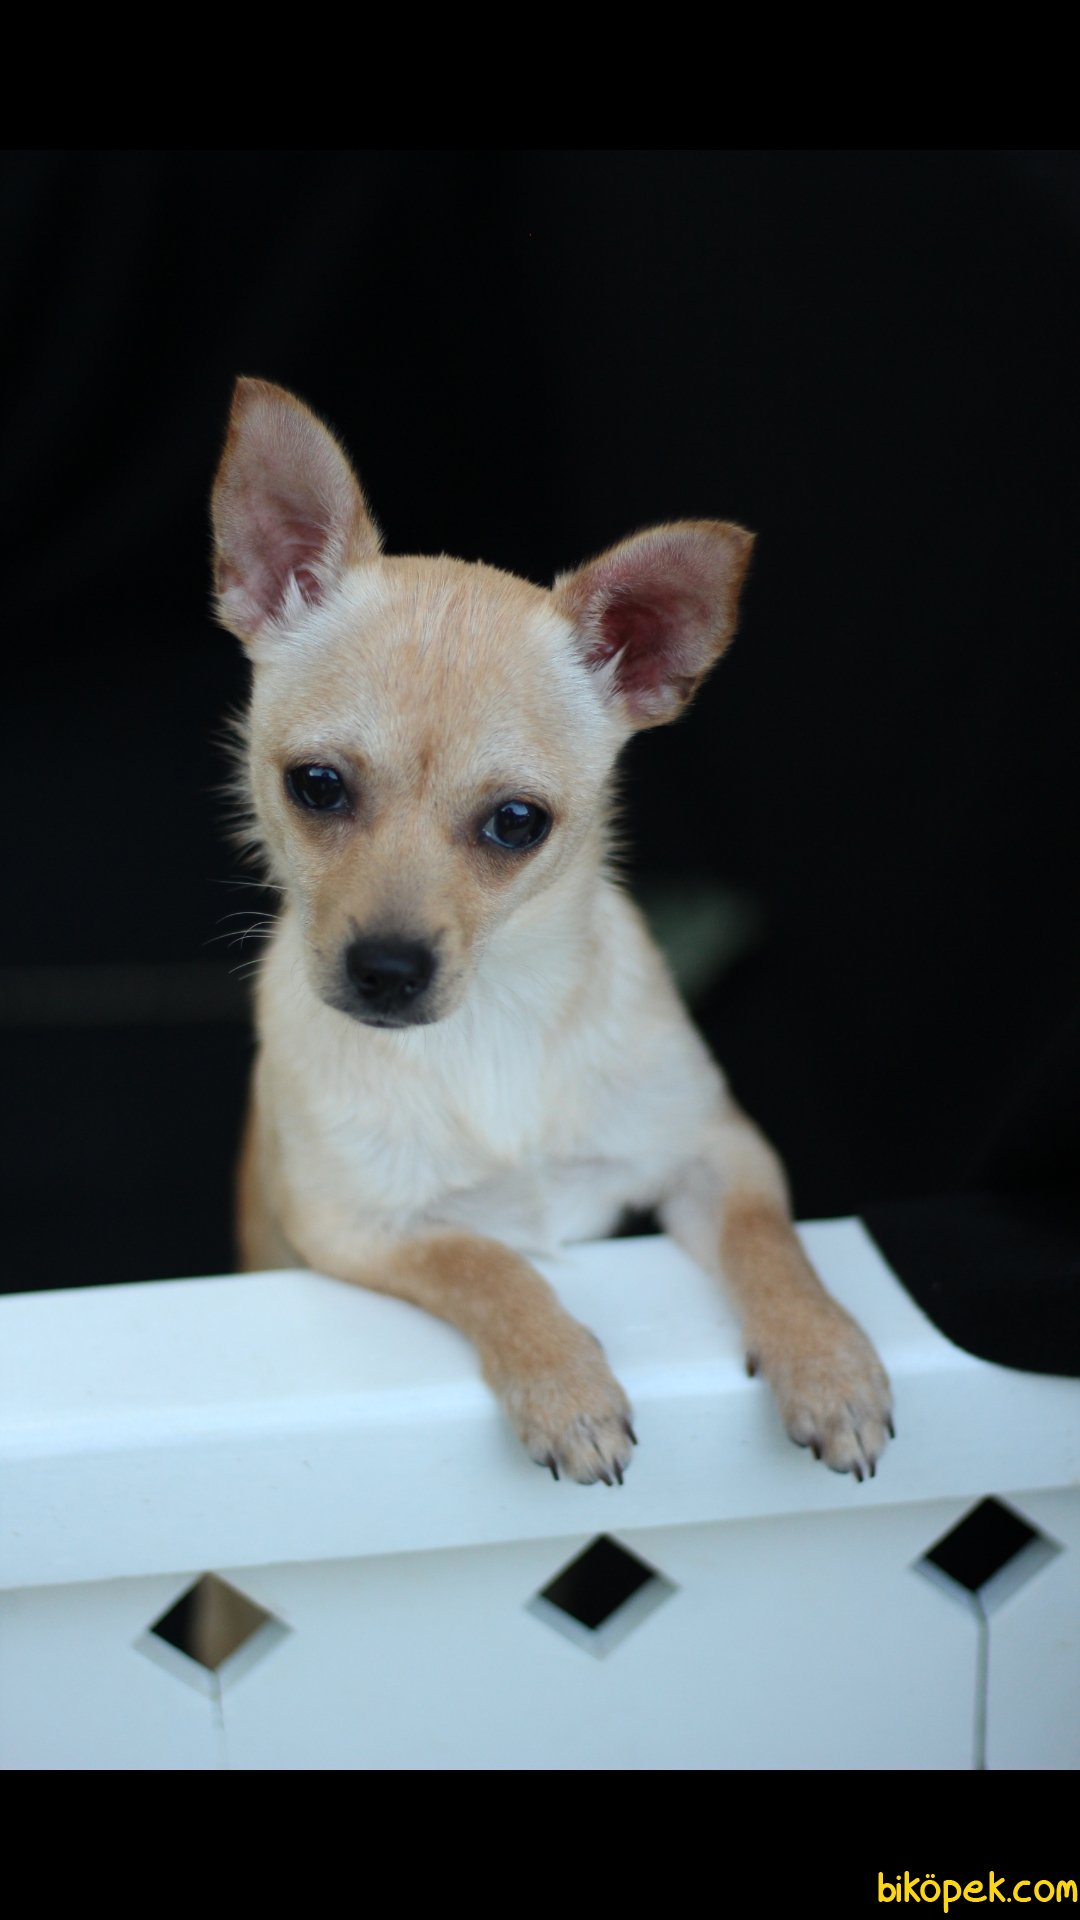 Chihuahua 'Akkuş Üretim Çiftliği' 2